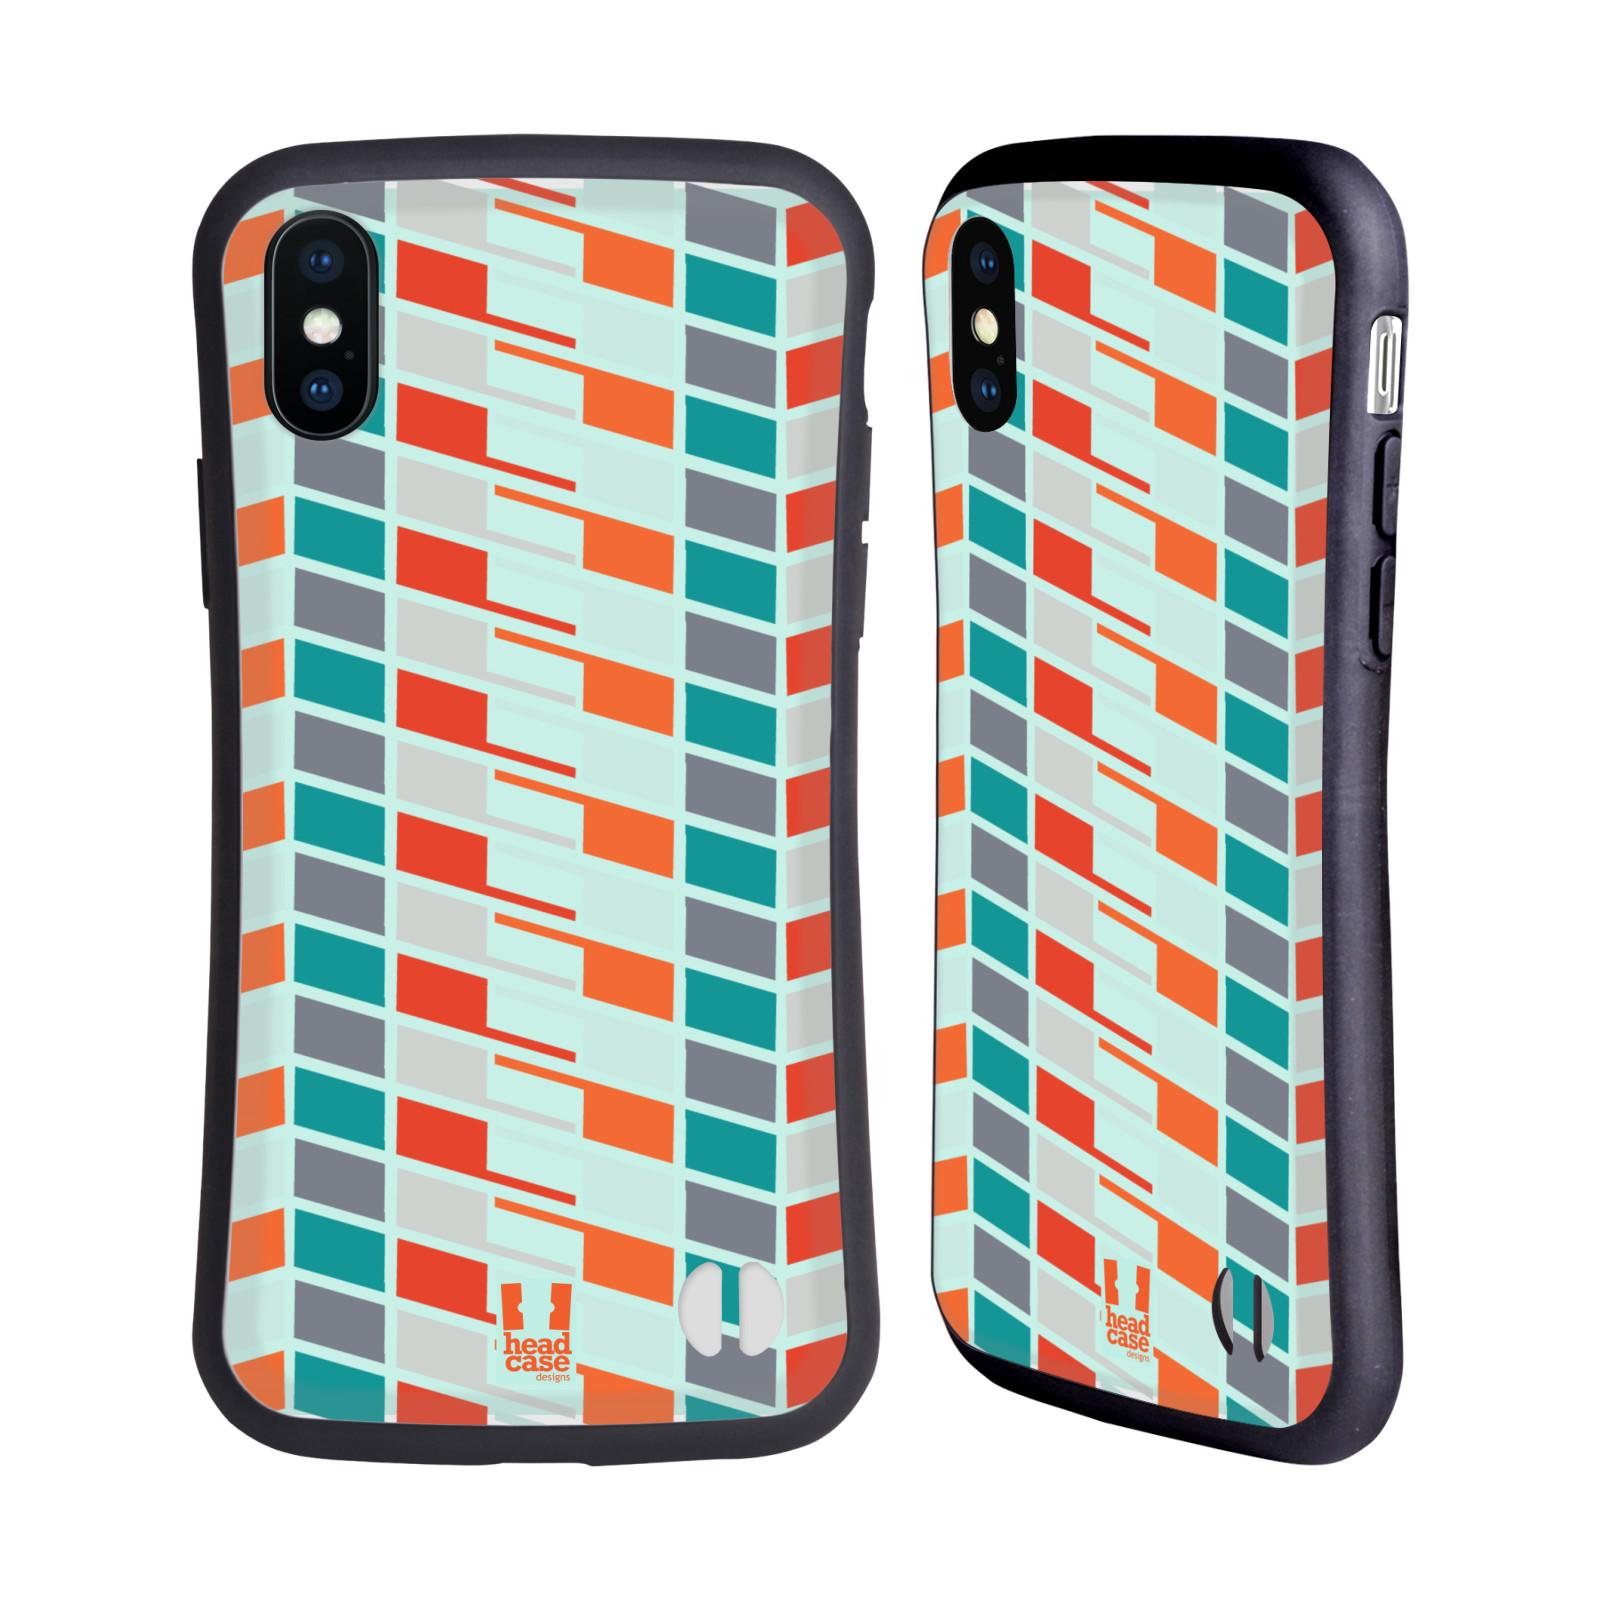 HEAD-CASE-DESIGNS-SOLEFUL-HYBRID-CASE-FOR-APPLE-iPHONE-X